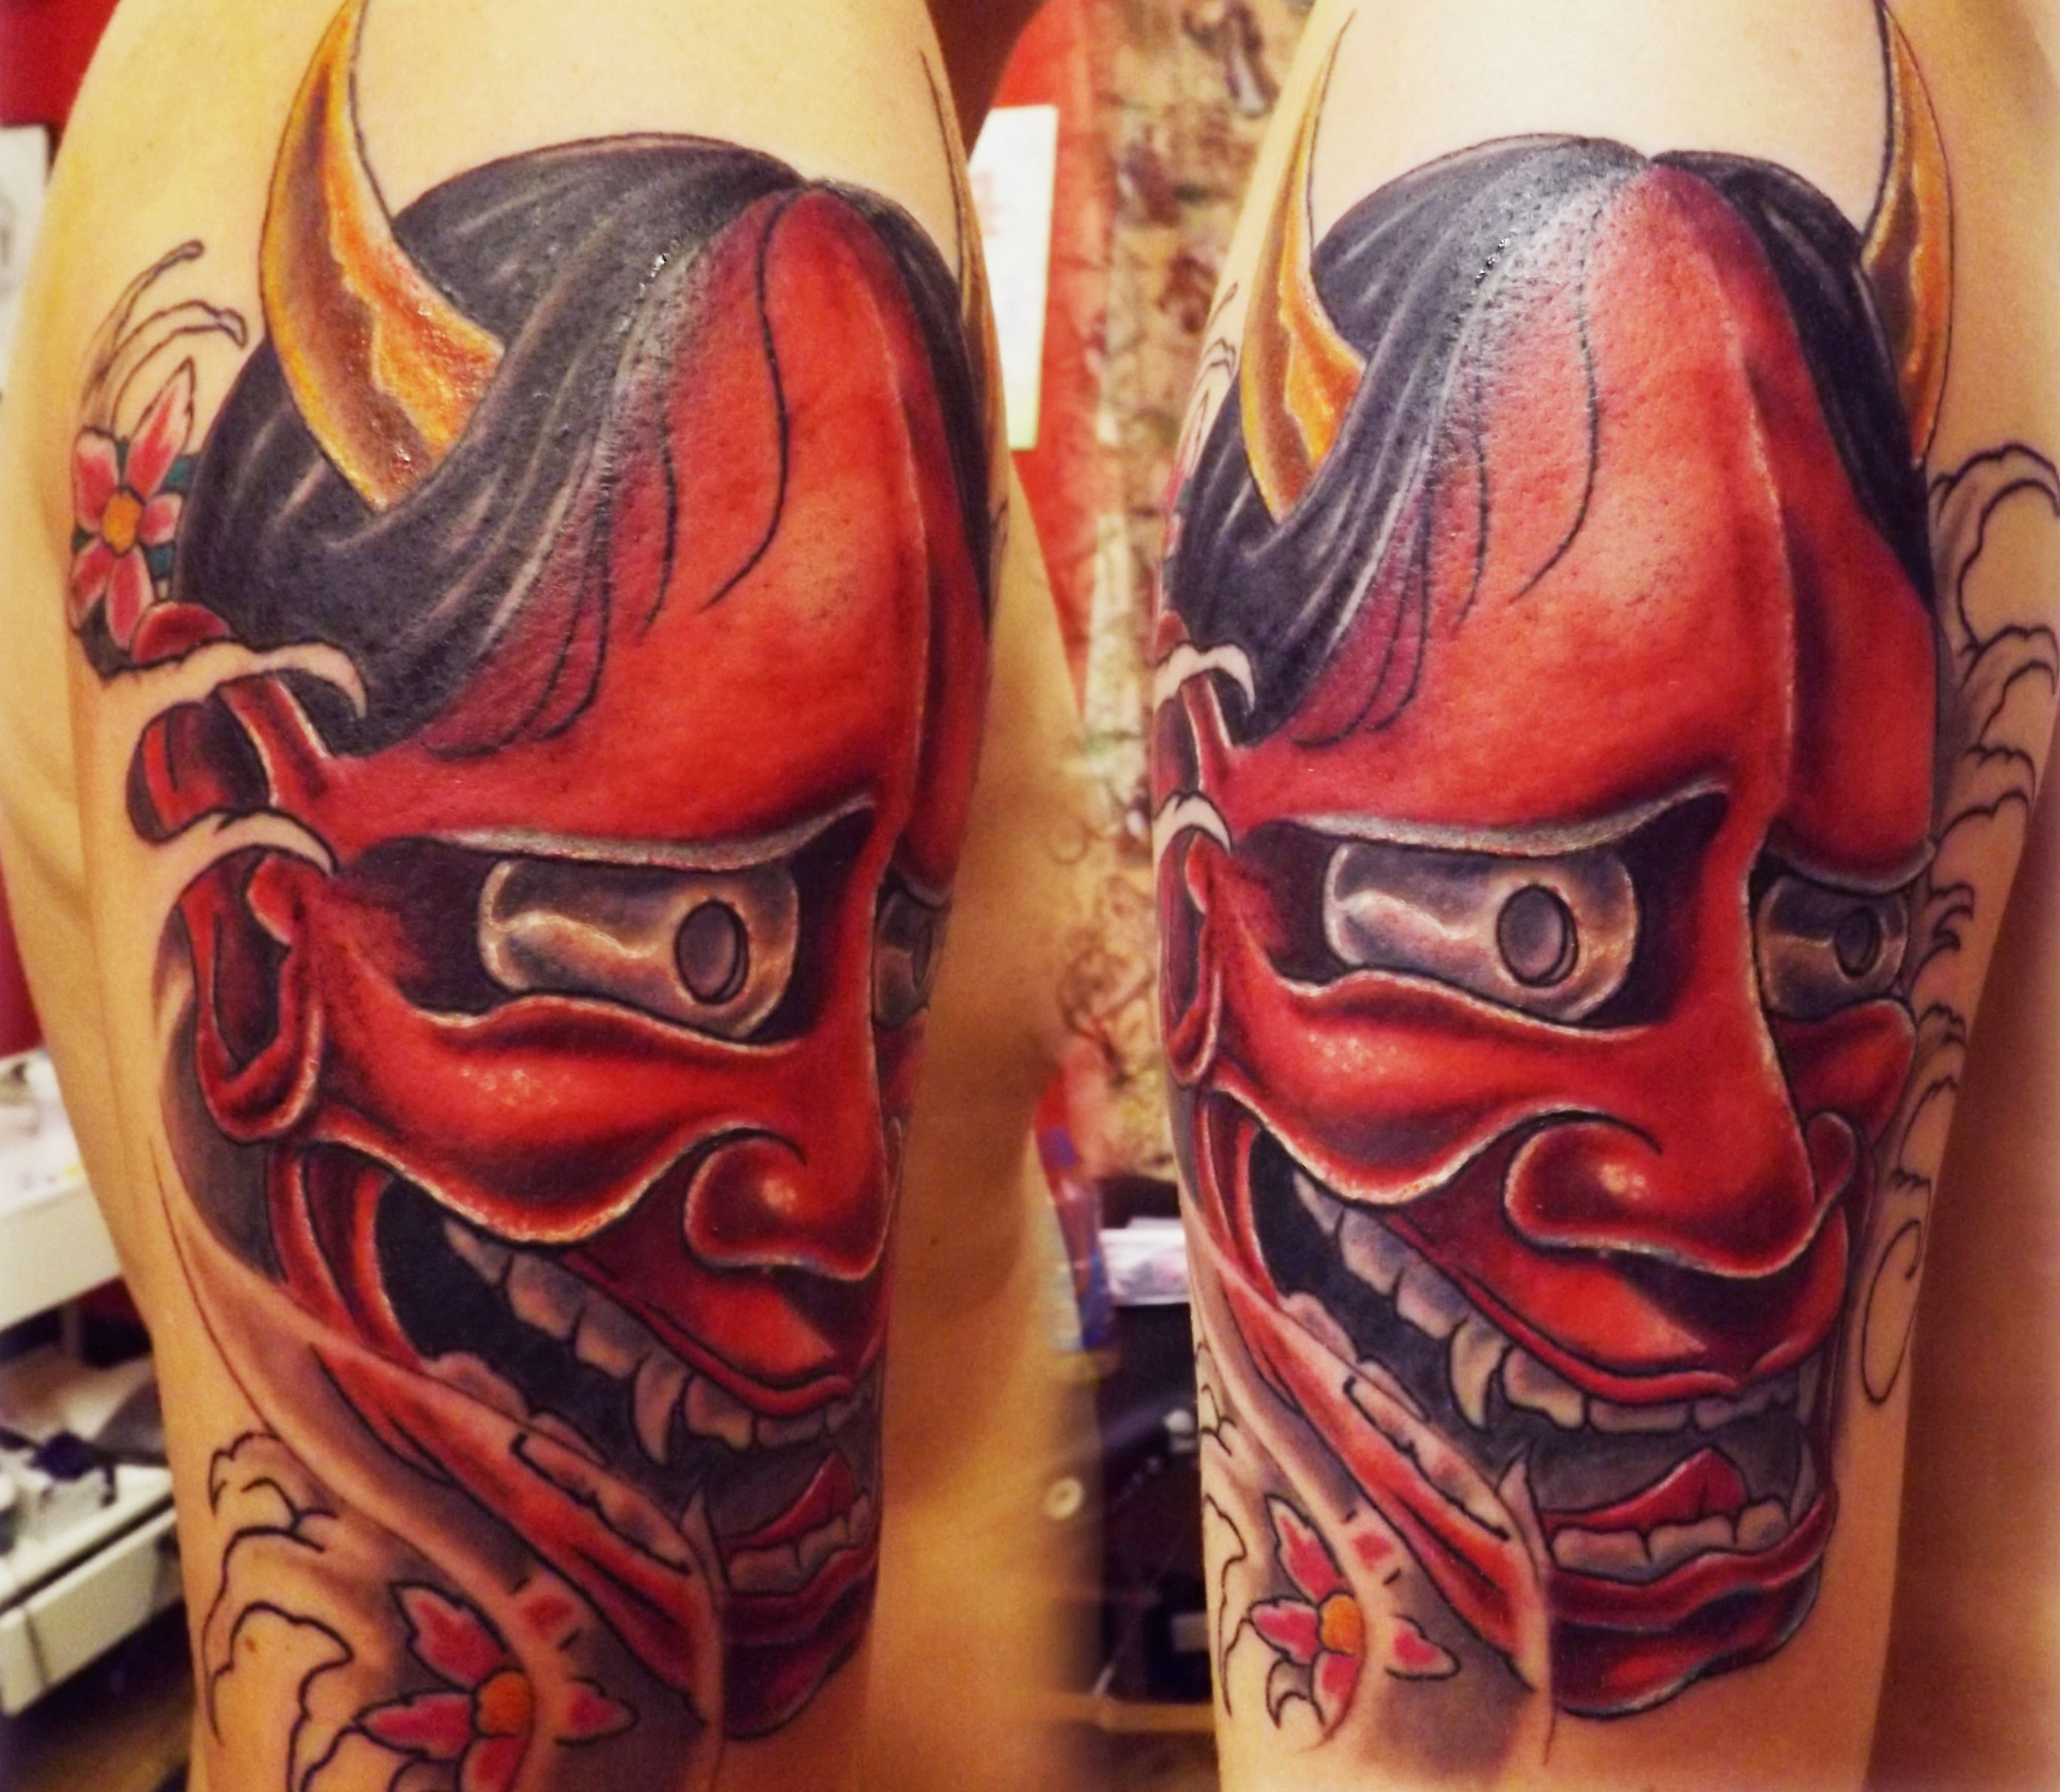 Hannya mask tattoo Hannya mask tattoo, Bone tattoos, Tattoos